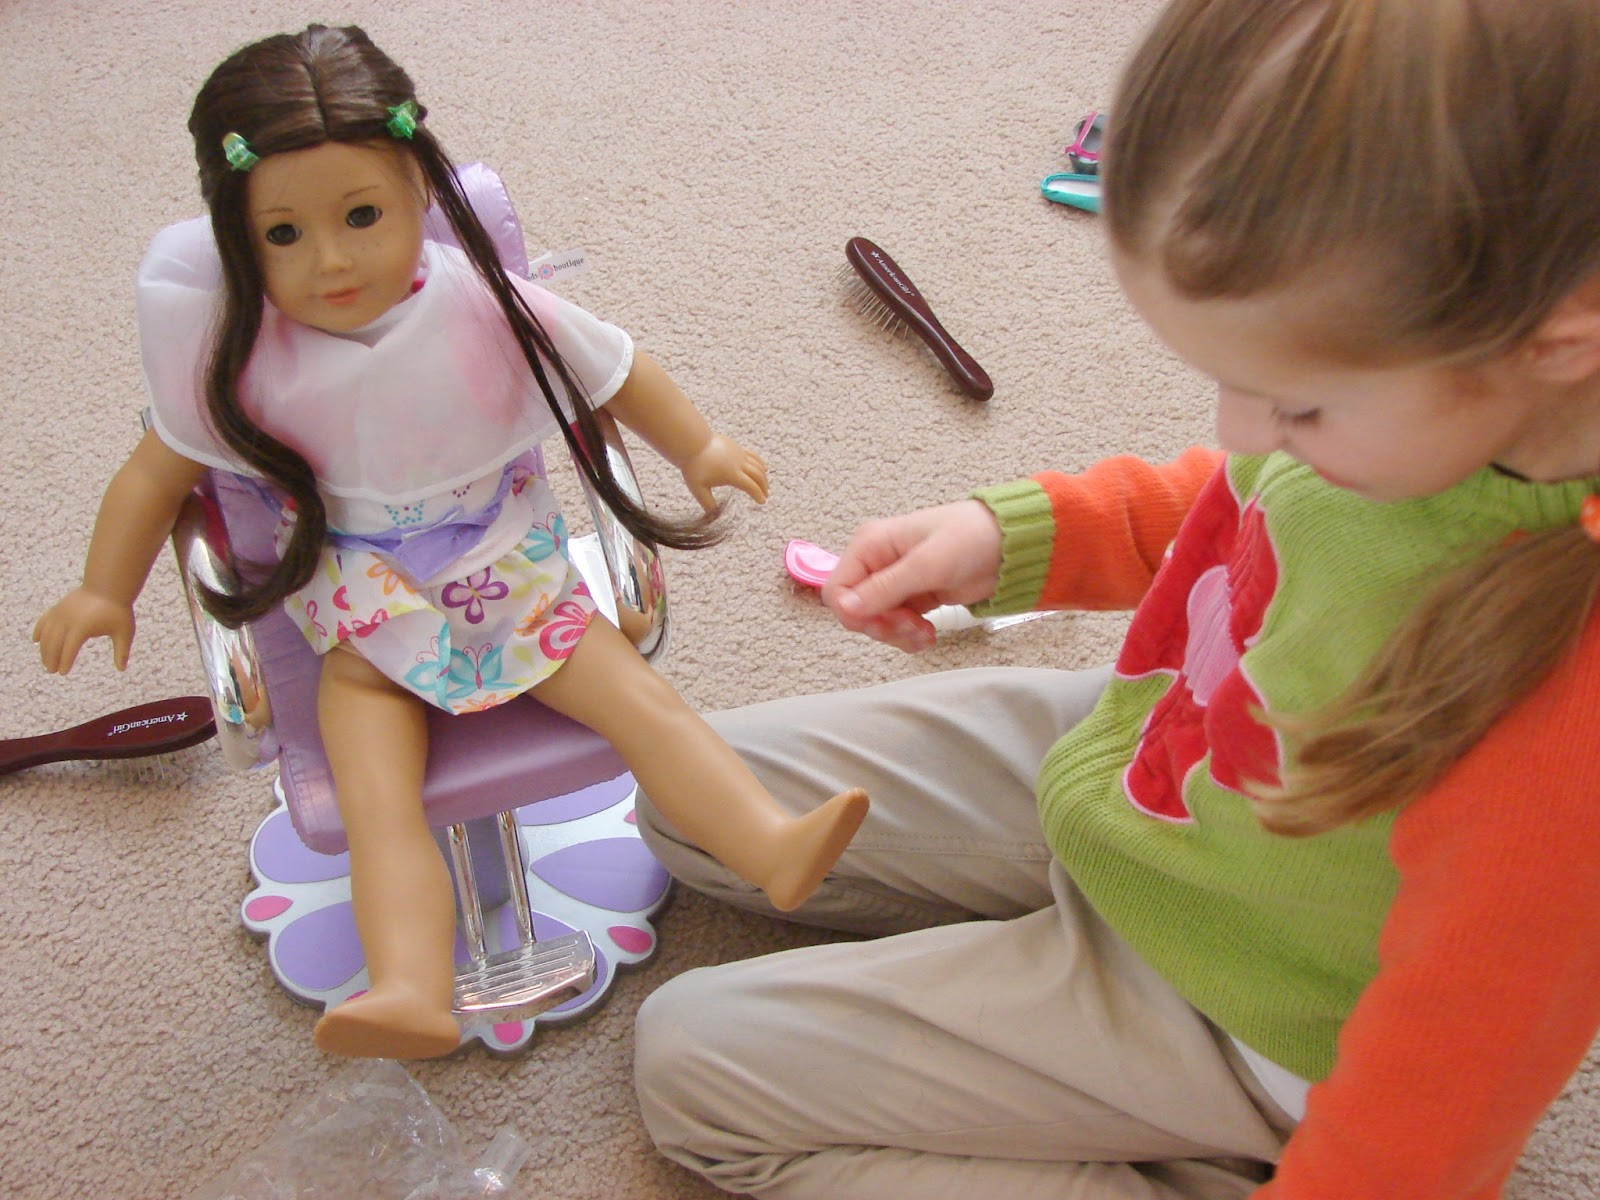 Doll Salon Chair Heavy Duty Desk American Girl Play Hair Styling